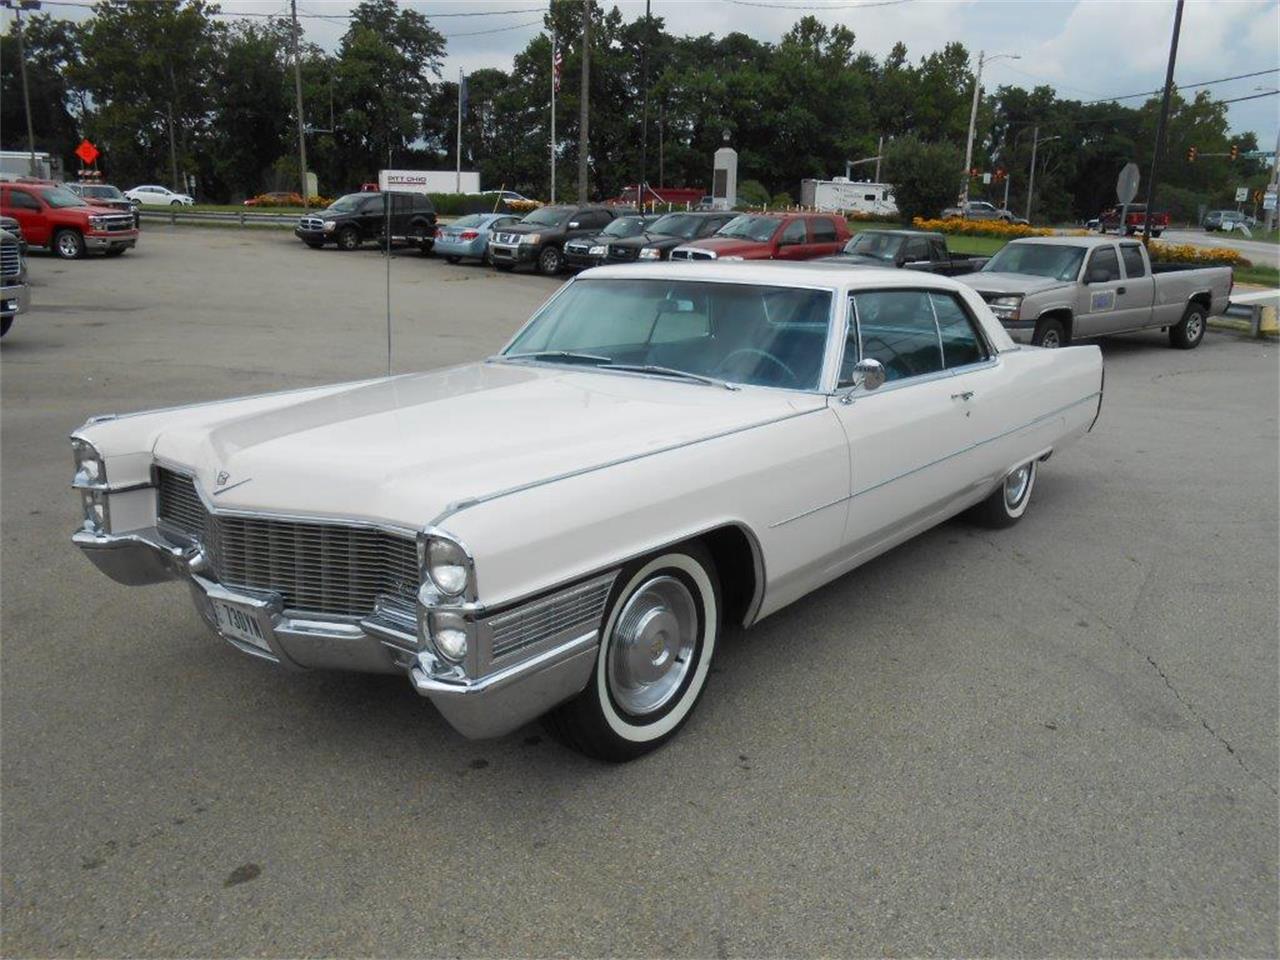 1965 Cadillac Coupe DeVille for Sale | ClassicCars.com ...